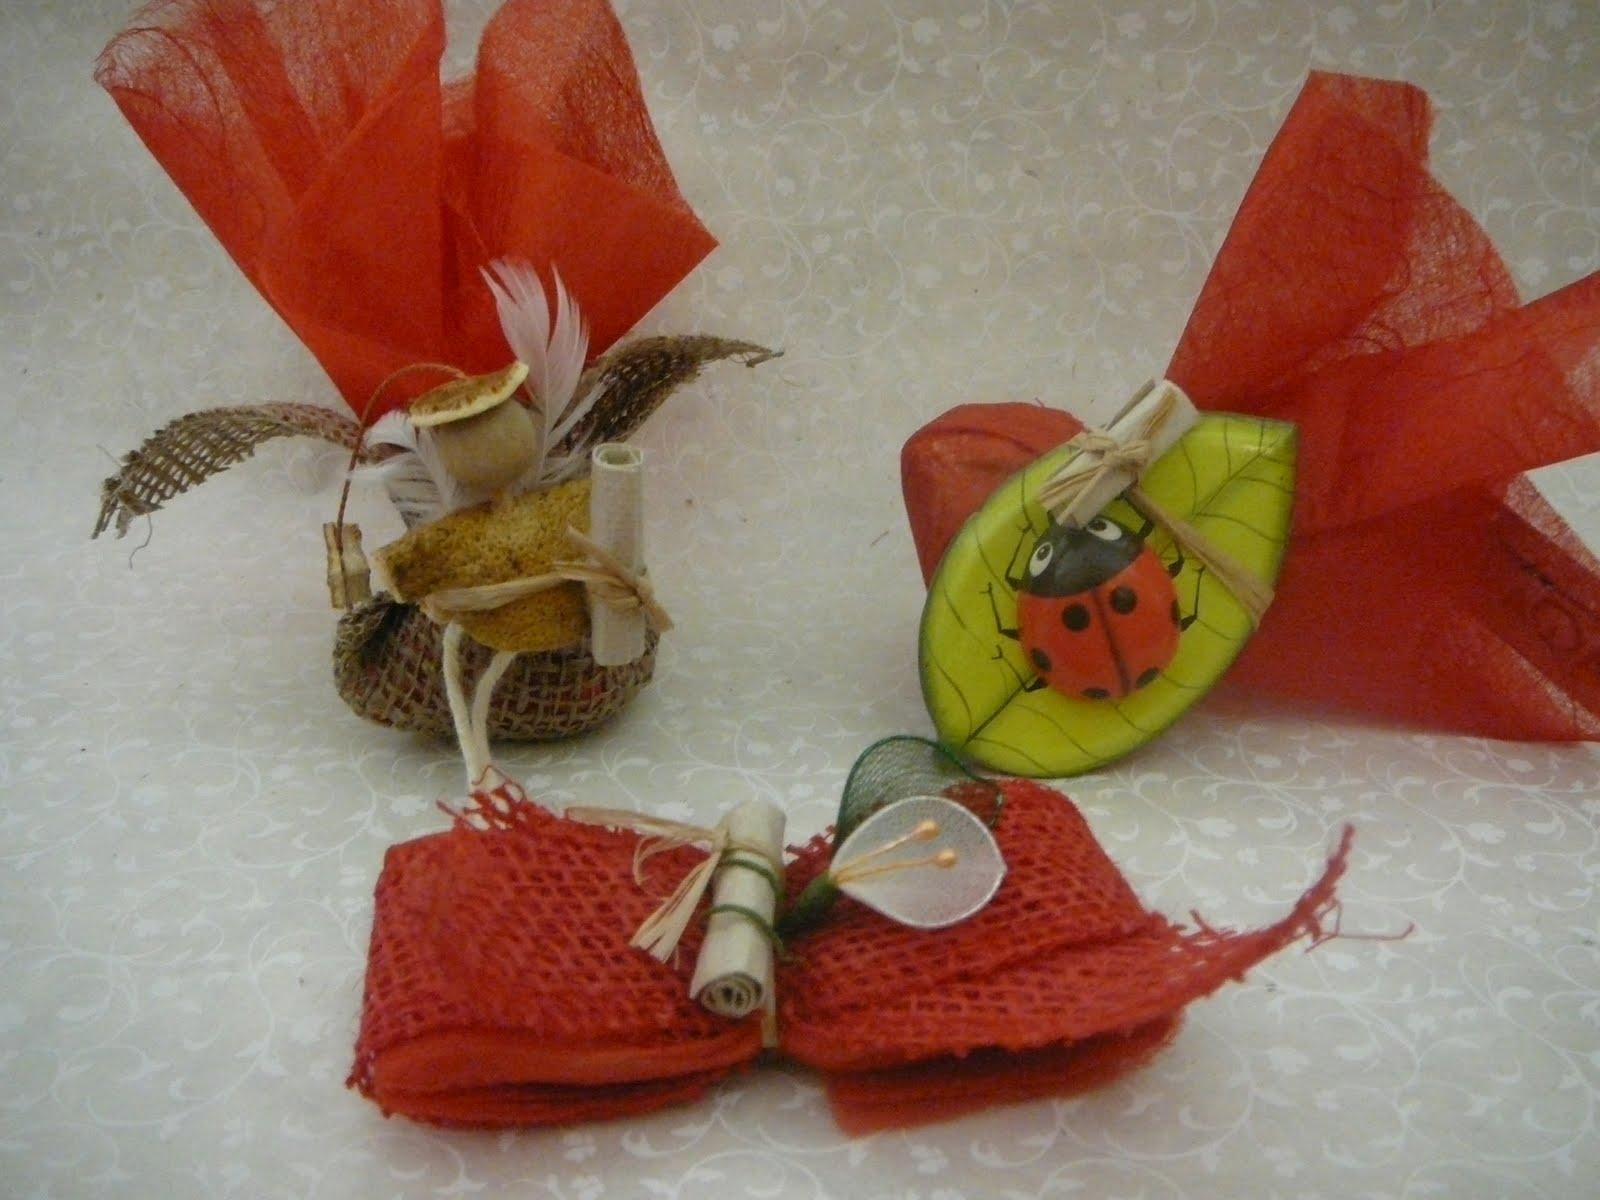 Bomboniere Matrimonio Simbolico : Bomboniere matrimonio simbolico gallery tableau mariage